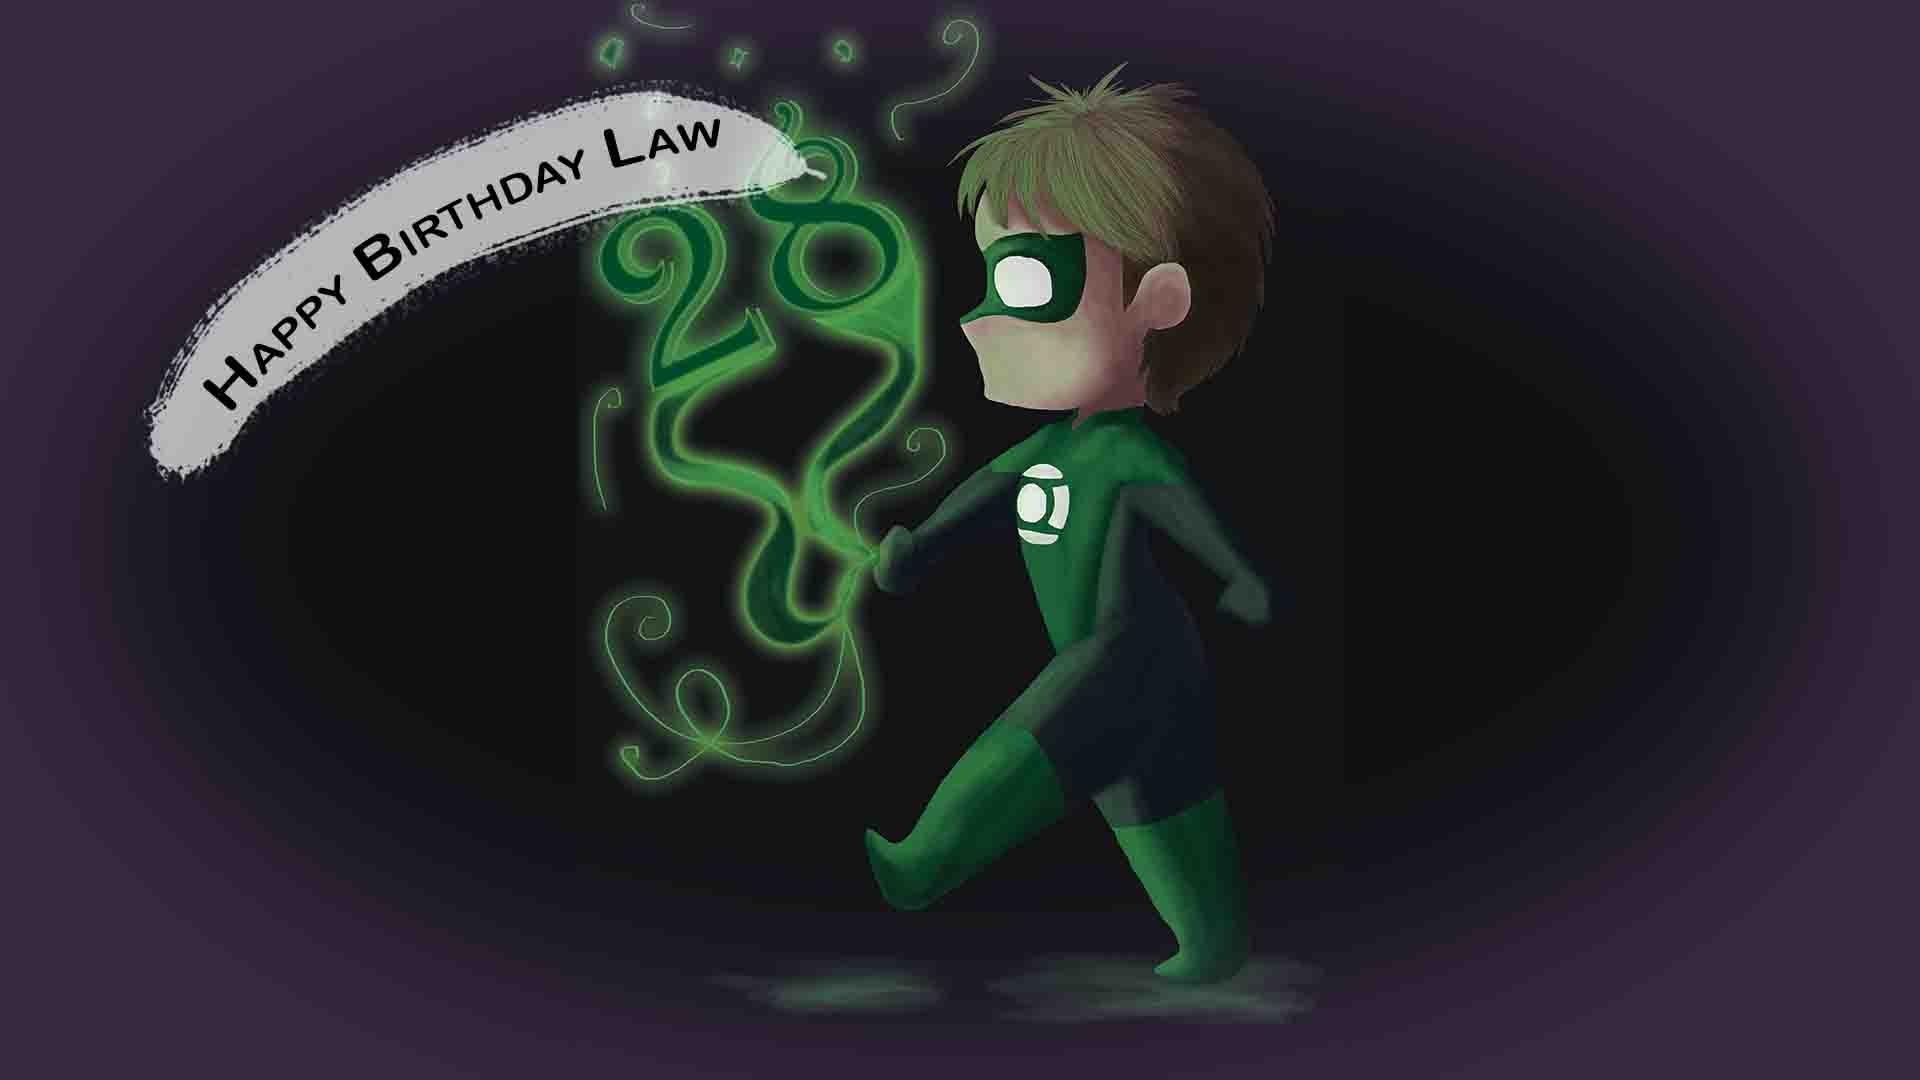 Birthday Art for Law // Green Lantern Chibi